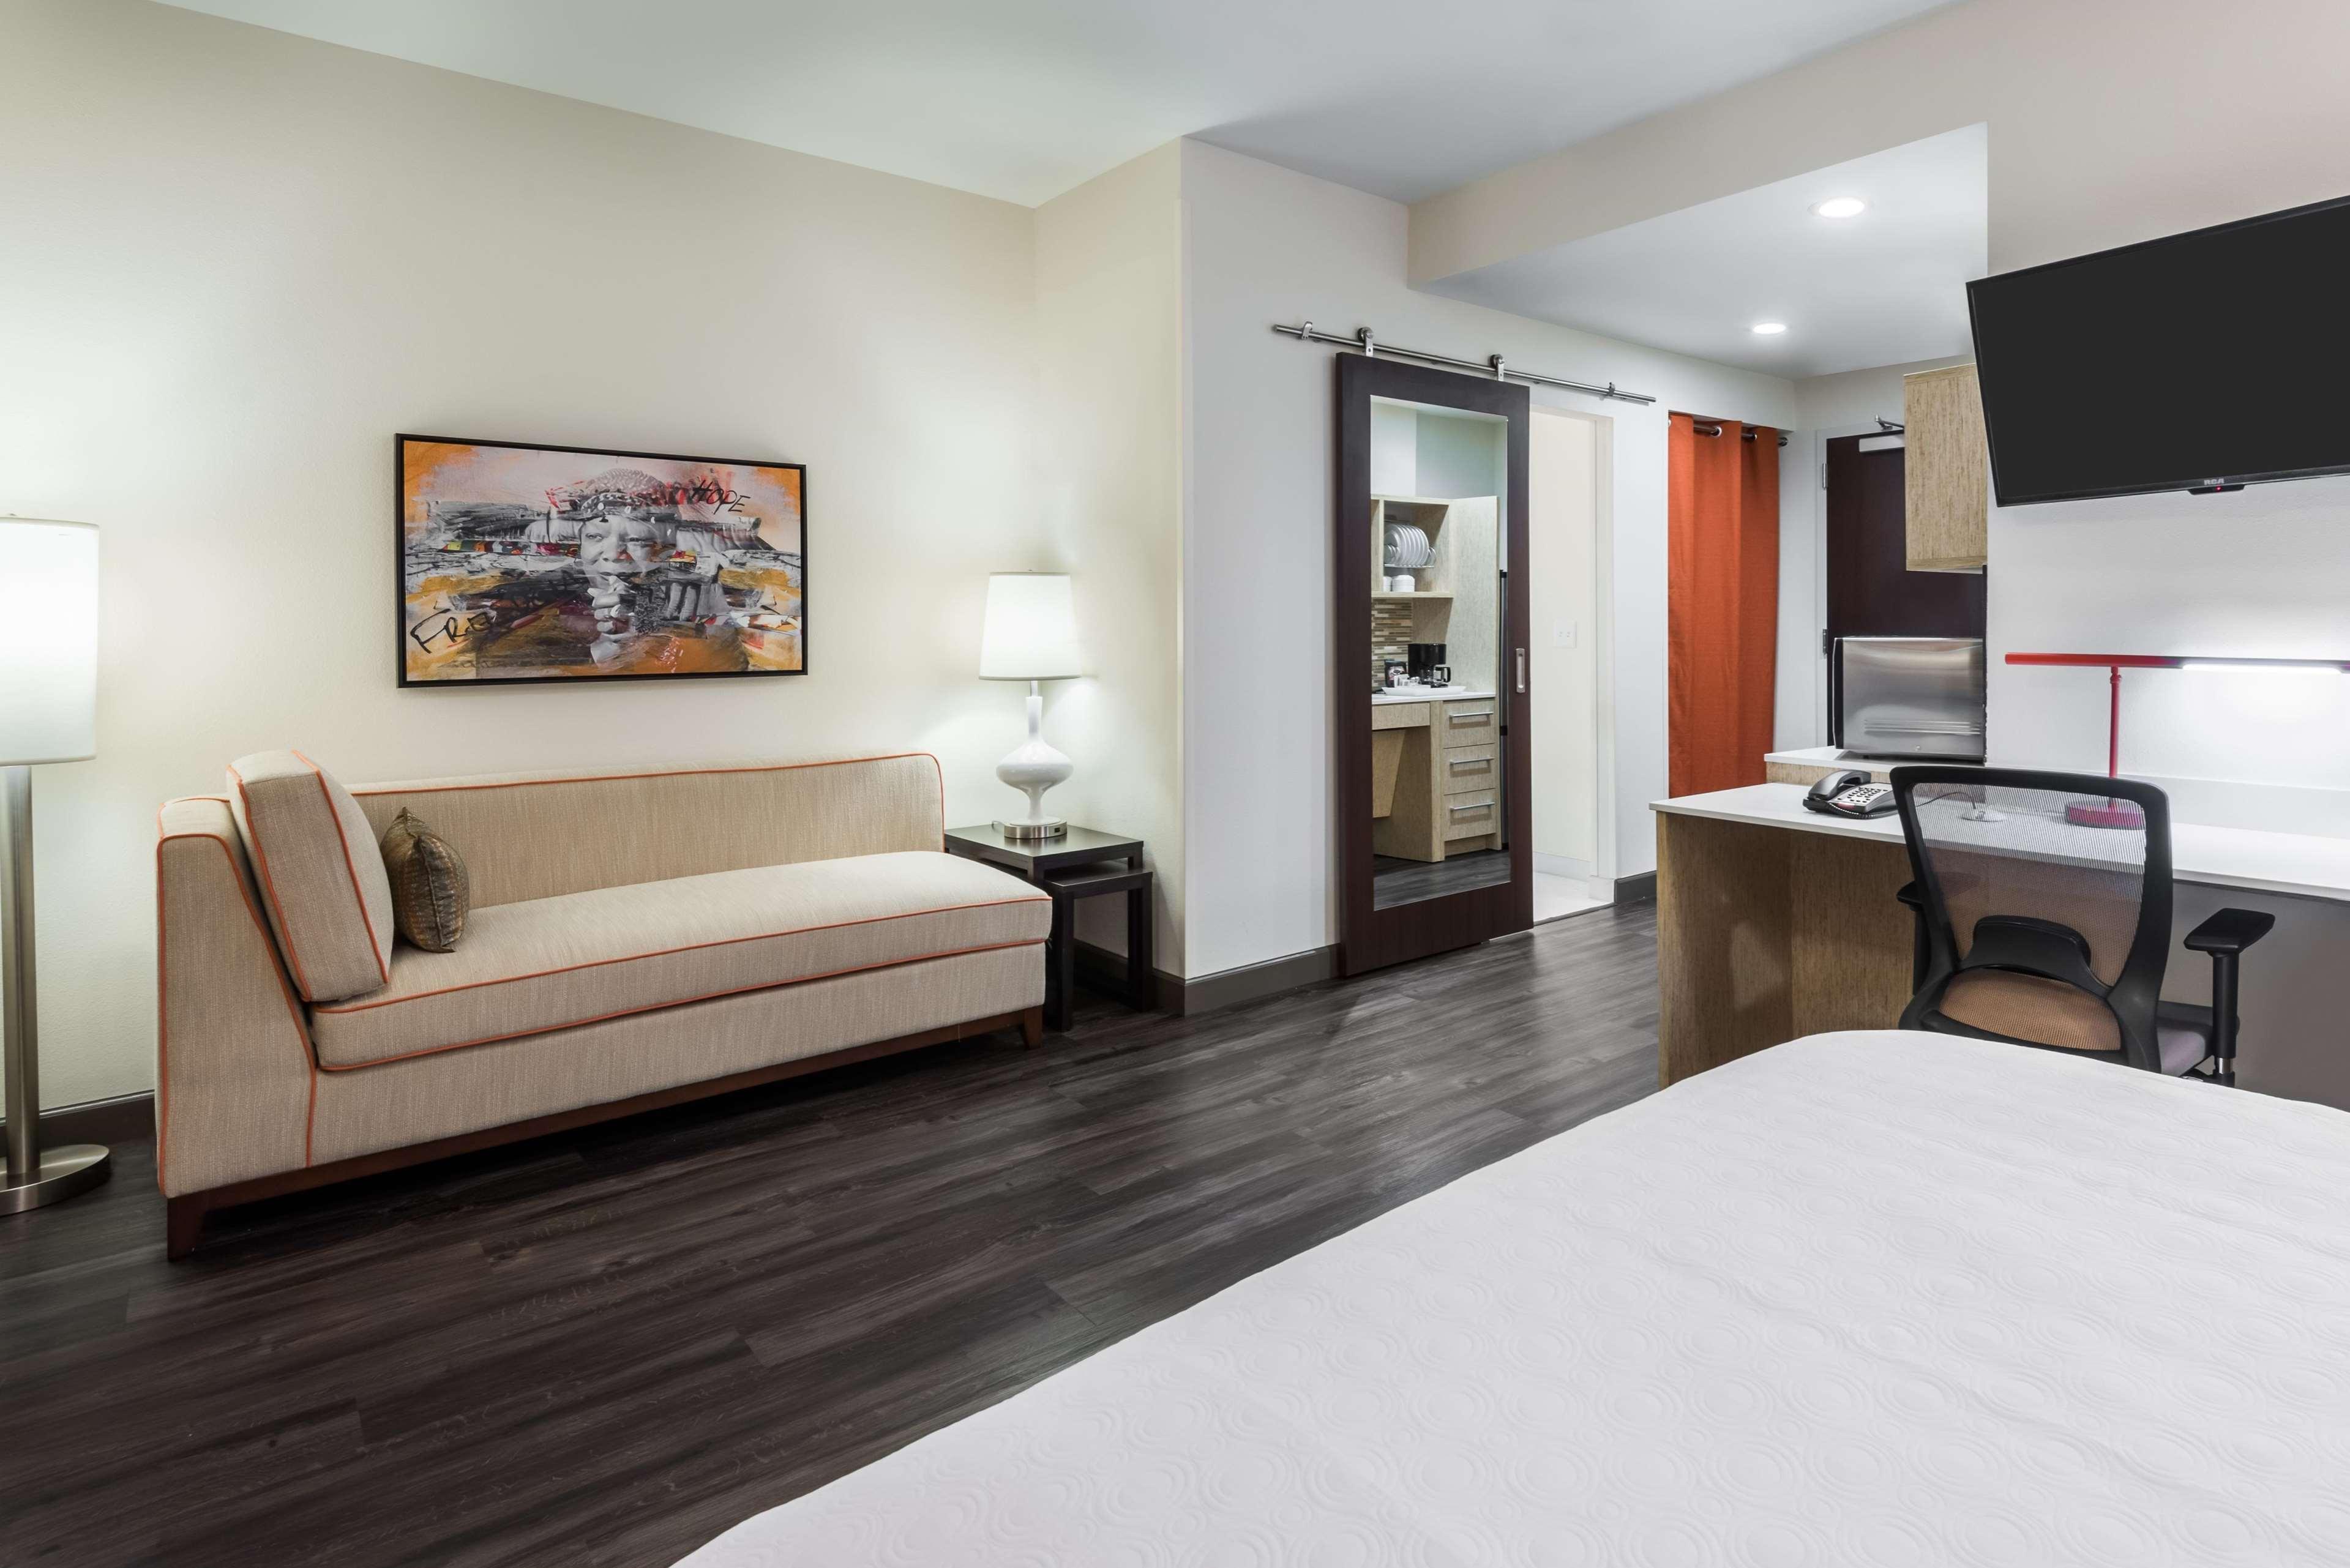 Home2 Suites by Hilton Atlanta Downtown image 0